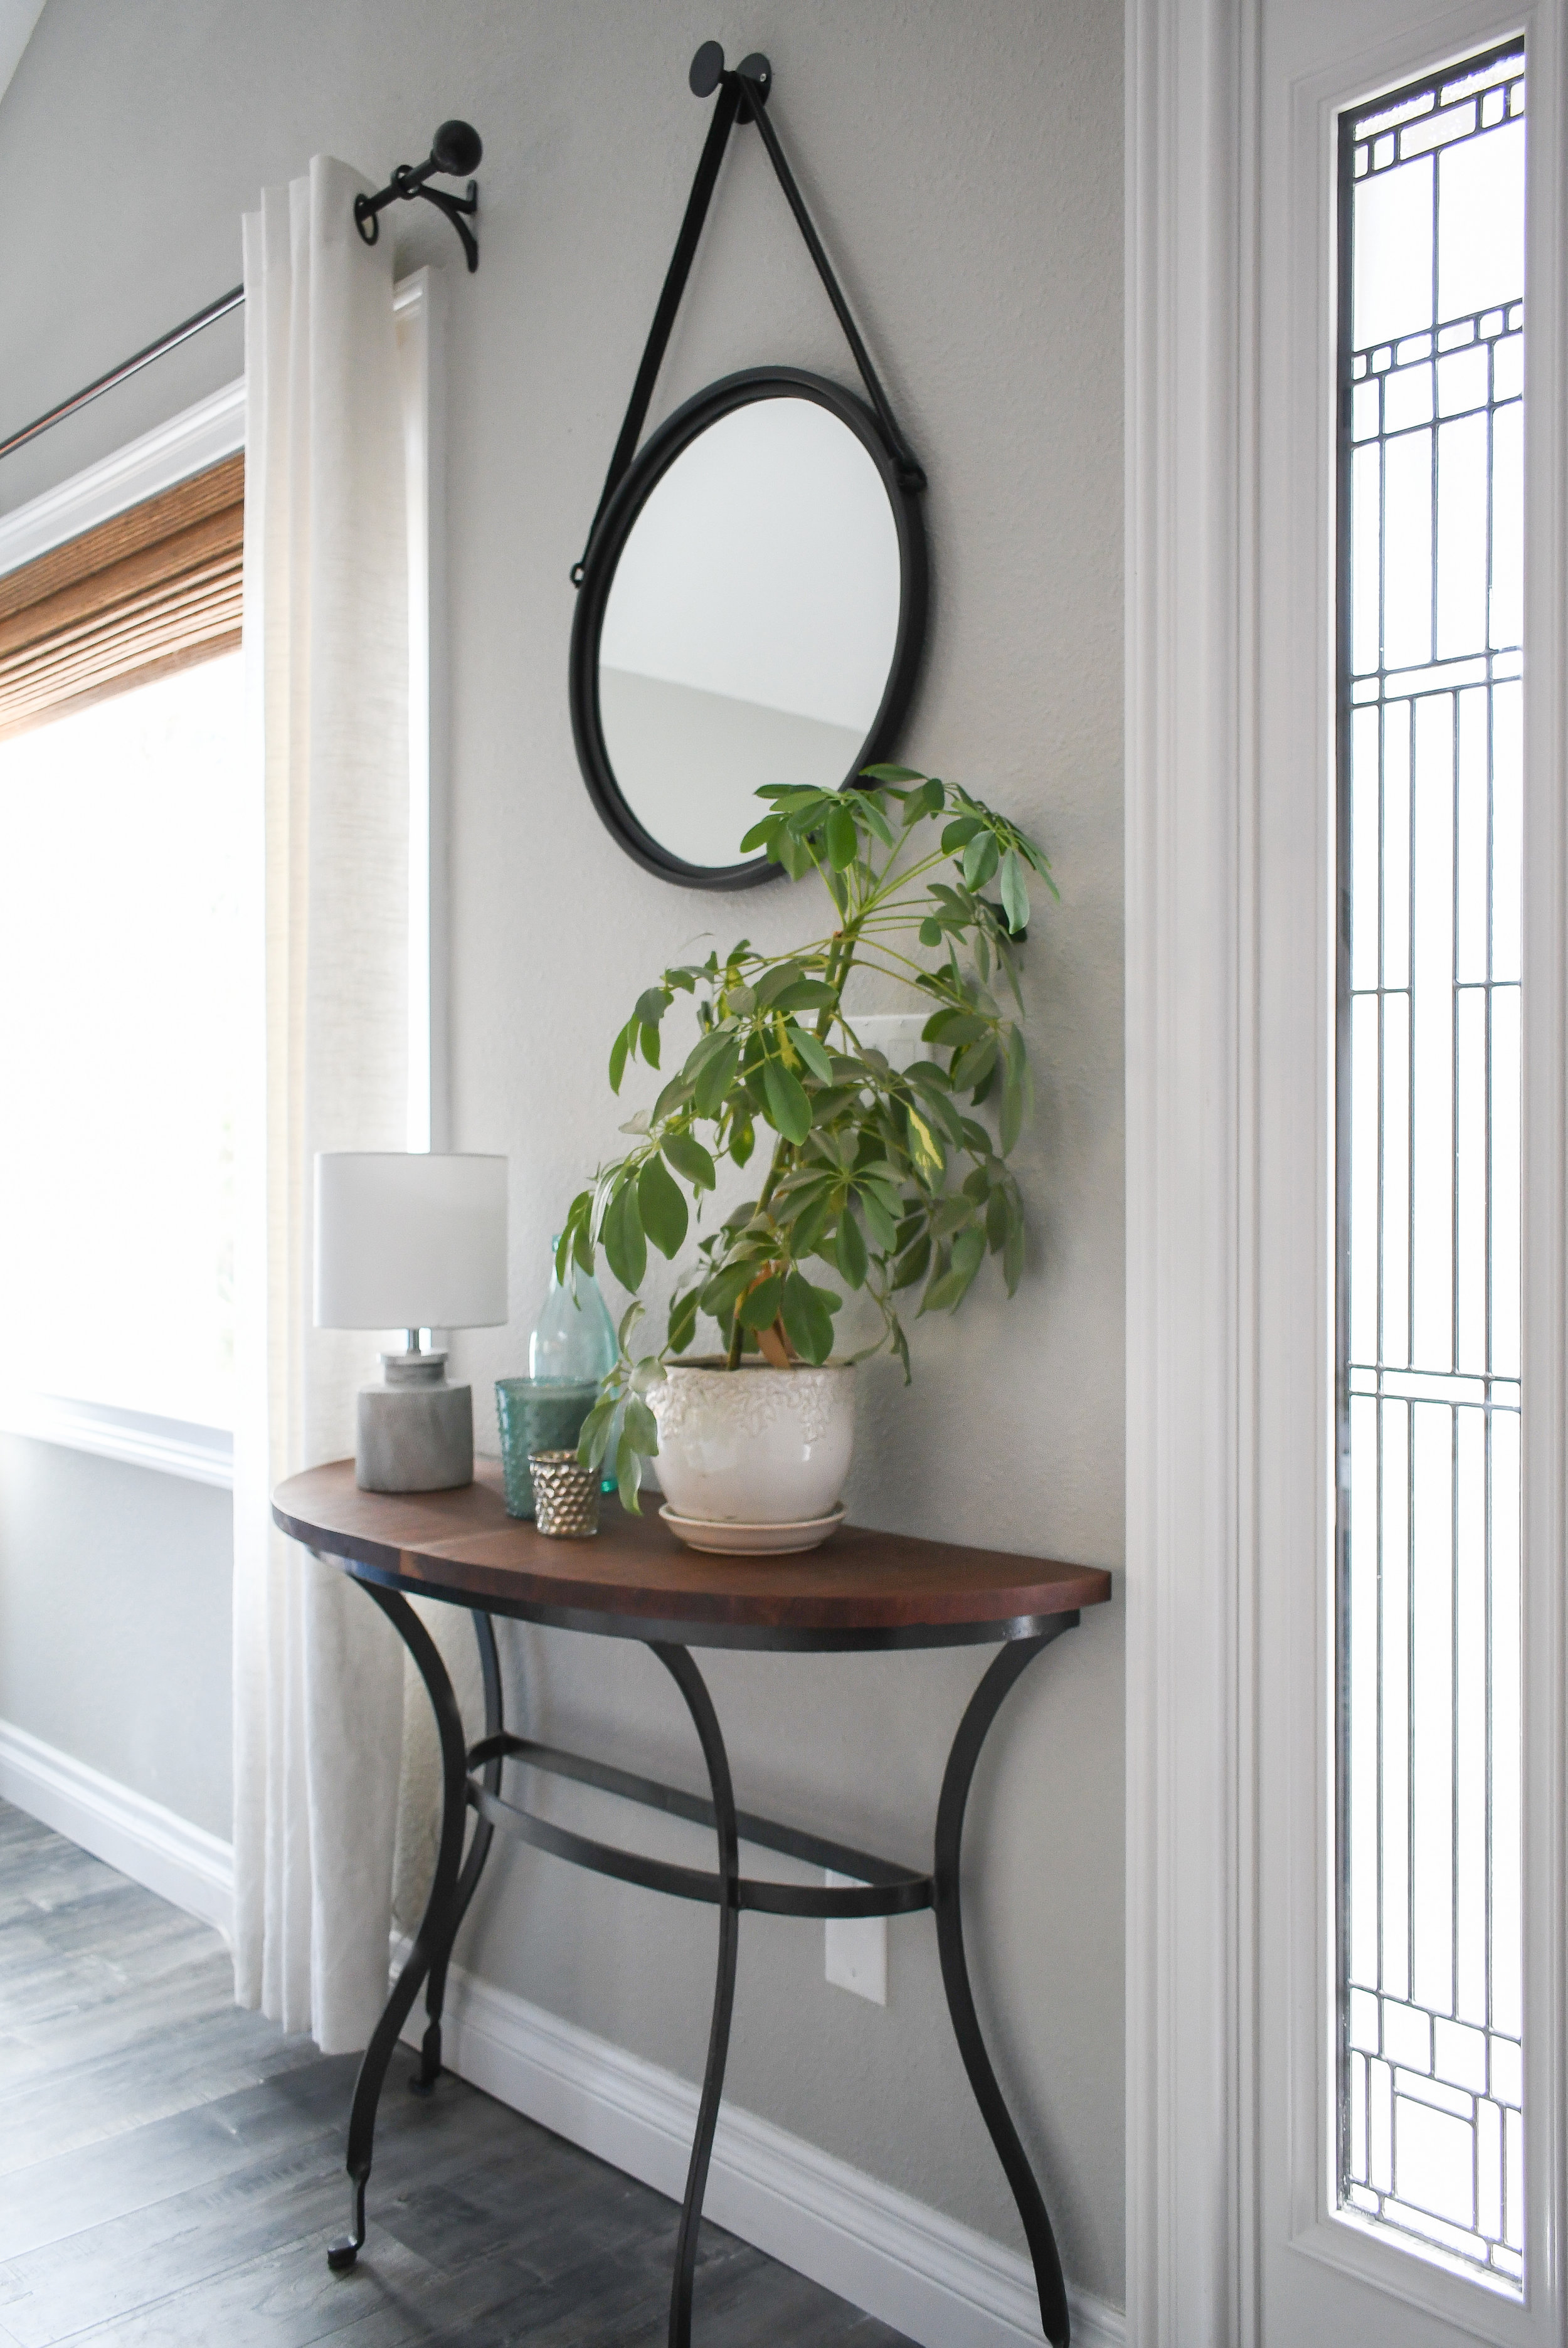 Angela Grace Design // Malone Living Room // San Francisco and SF Bay Area Interior Designer, Decorator